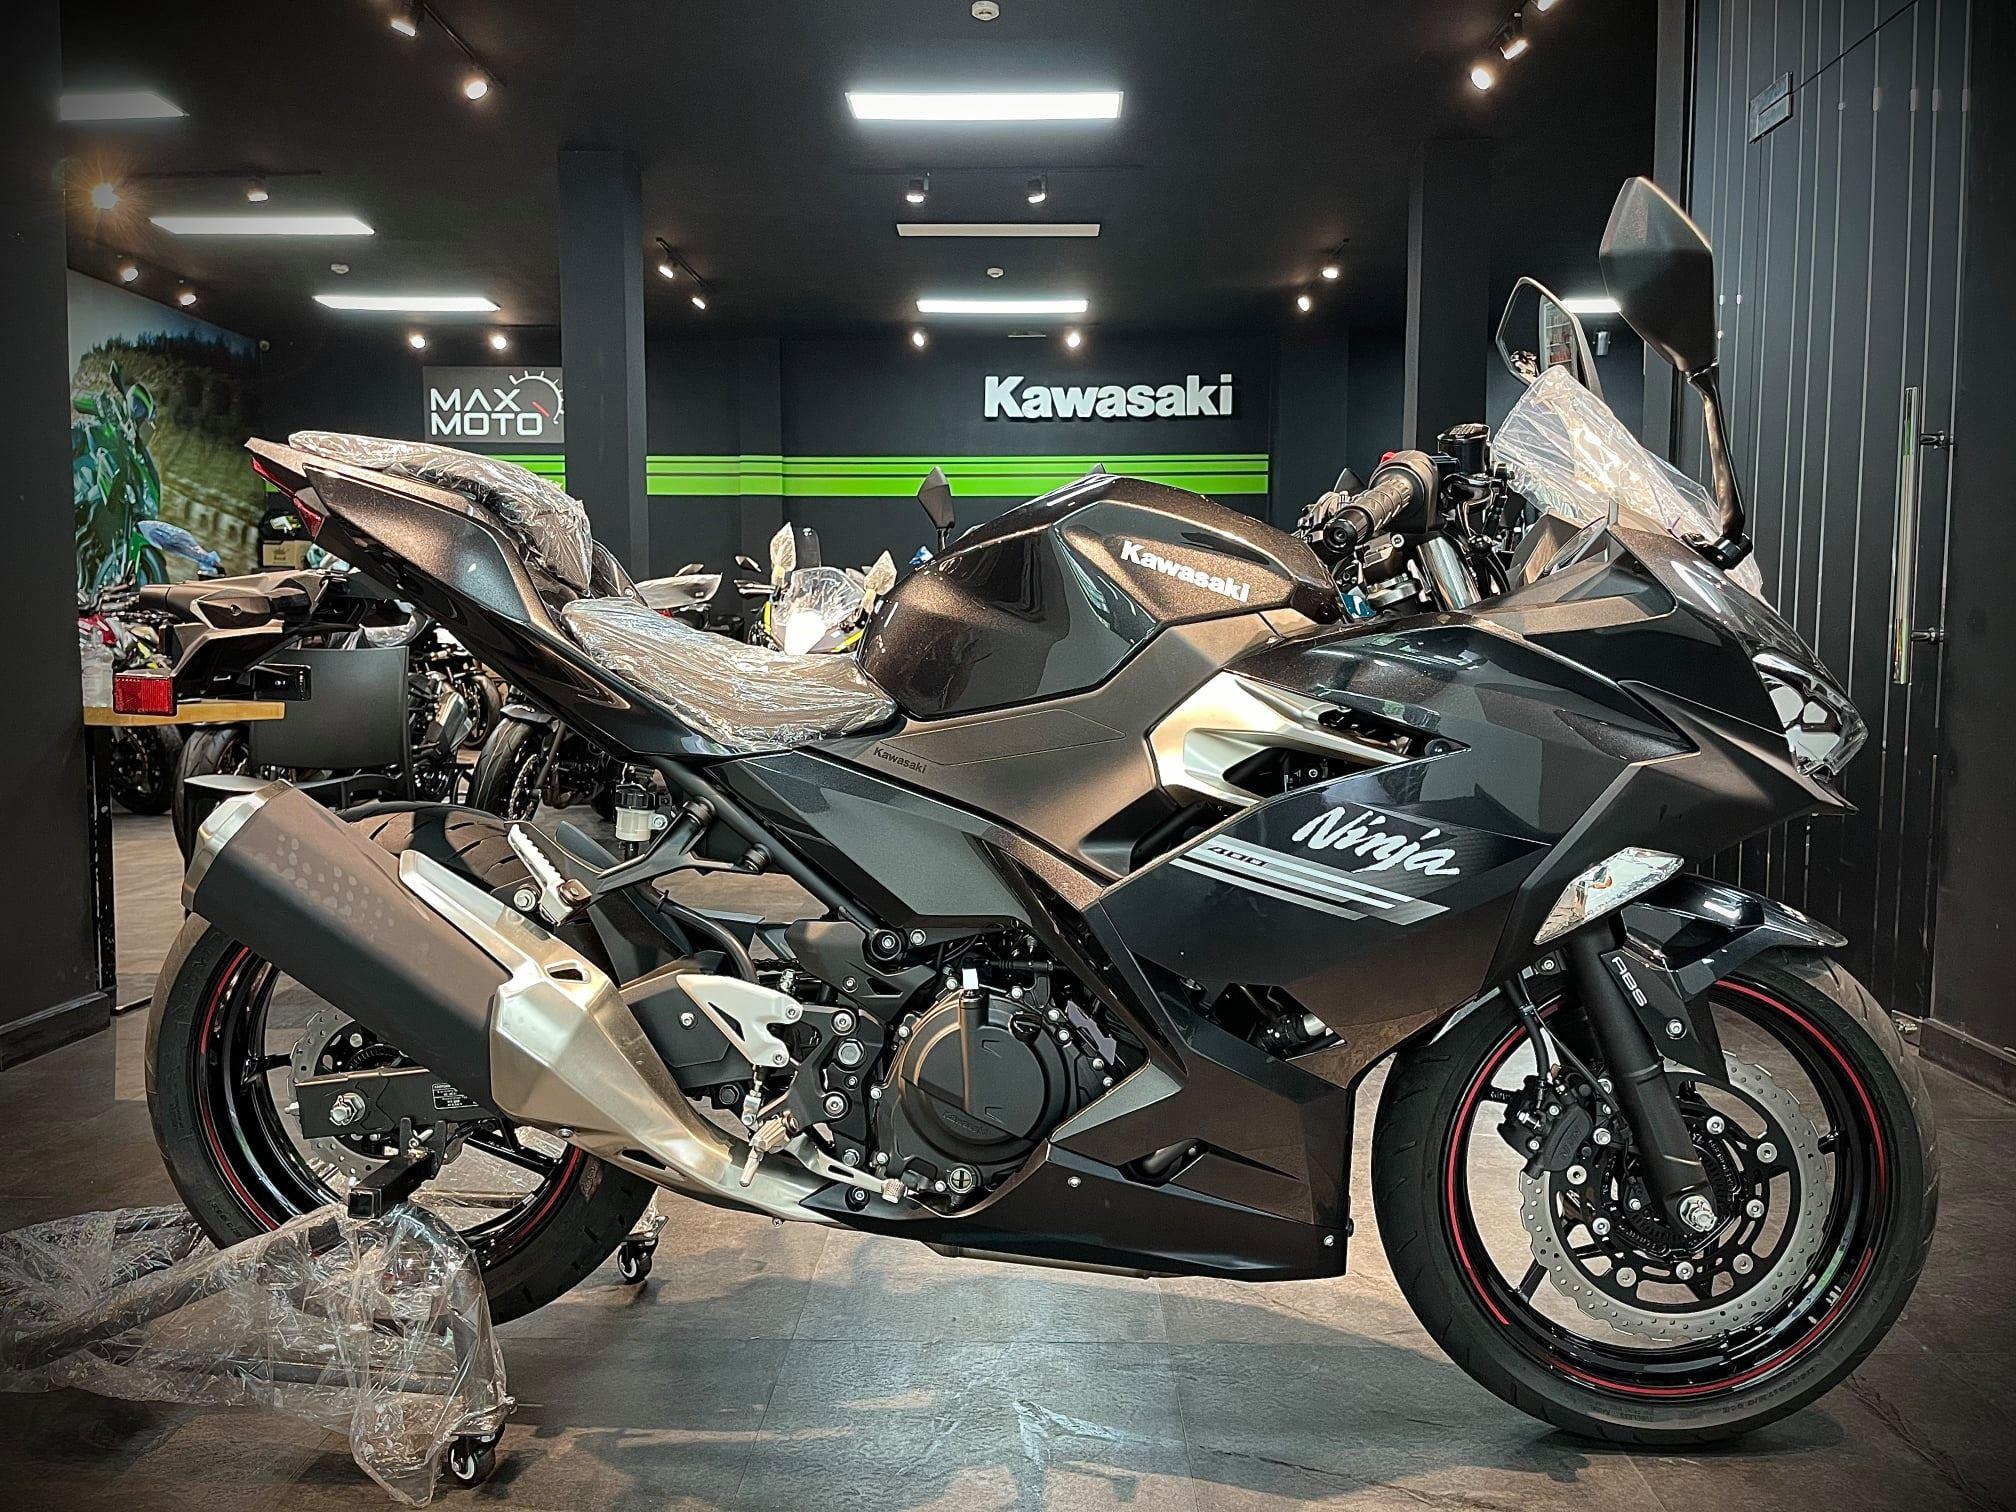 Kawasaki Ninja 400 2021 ấn tượng với diện mạo mới, giá từ 159 triệu đồng Kawawasaki Ninja 400 2021 (6).jpg